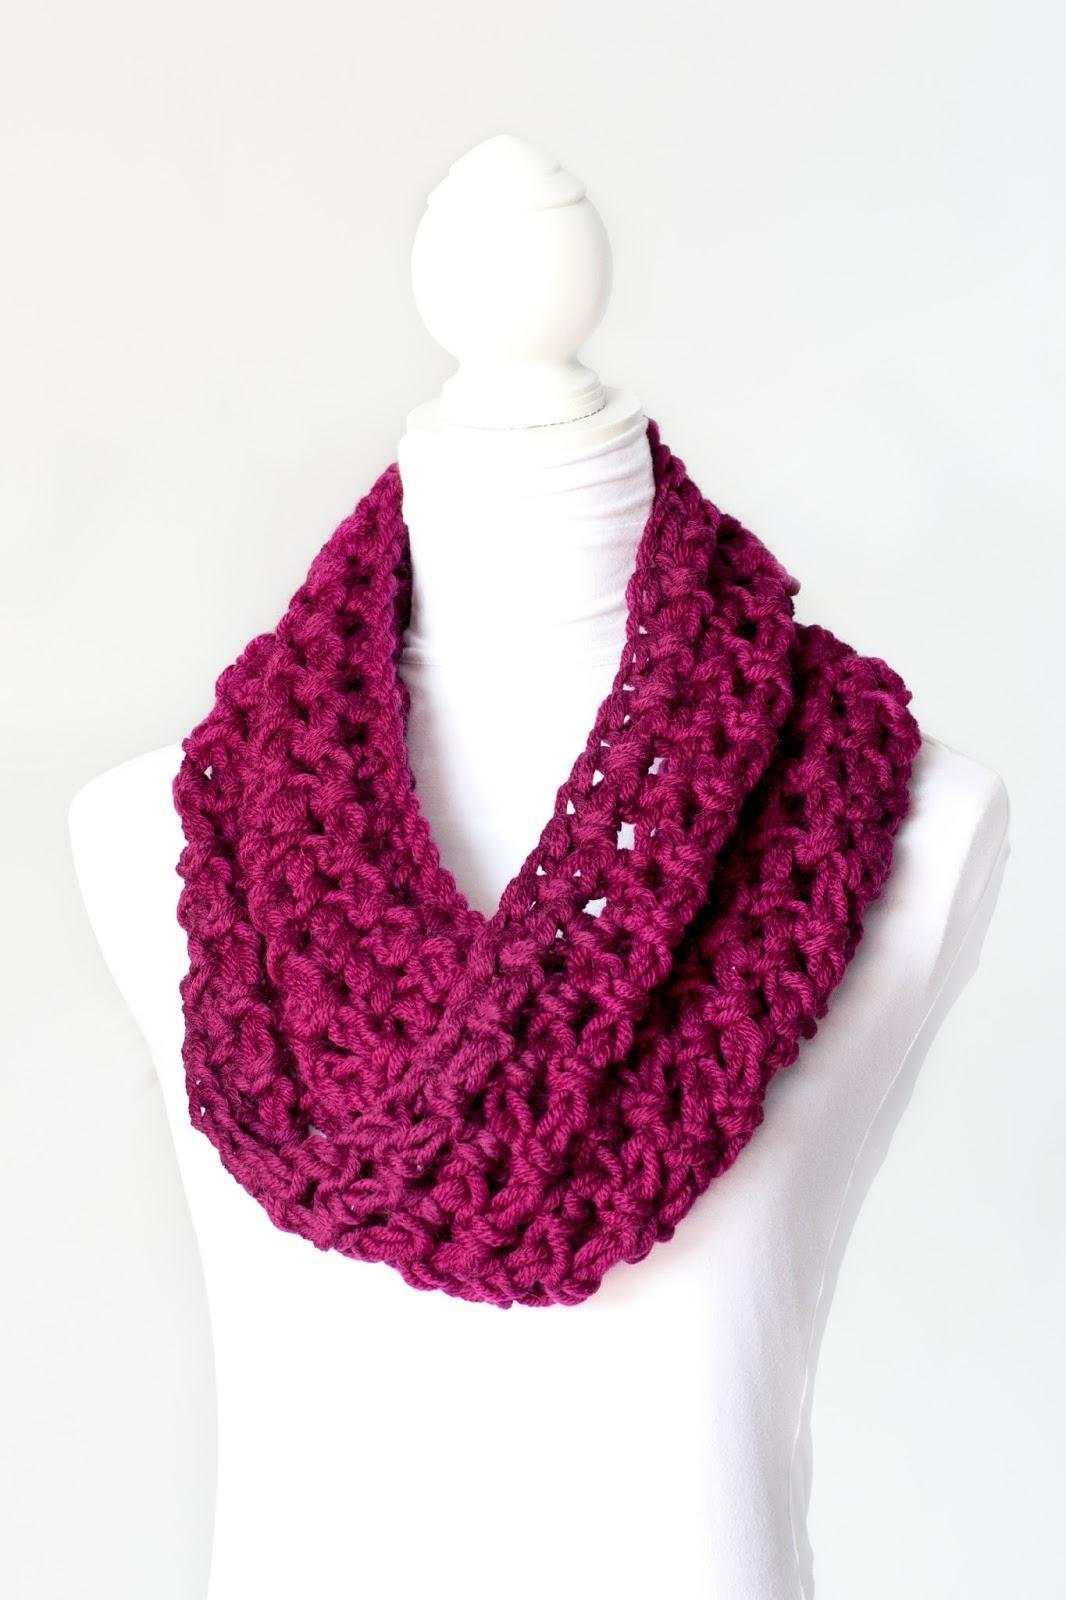 Free Crochet Patterns Easy Gifts : Hopeful Honey Craft, Crochet, Create: 10 Quick & Easy ...